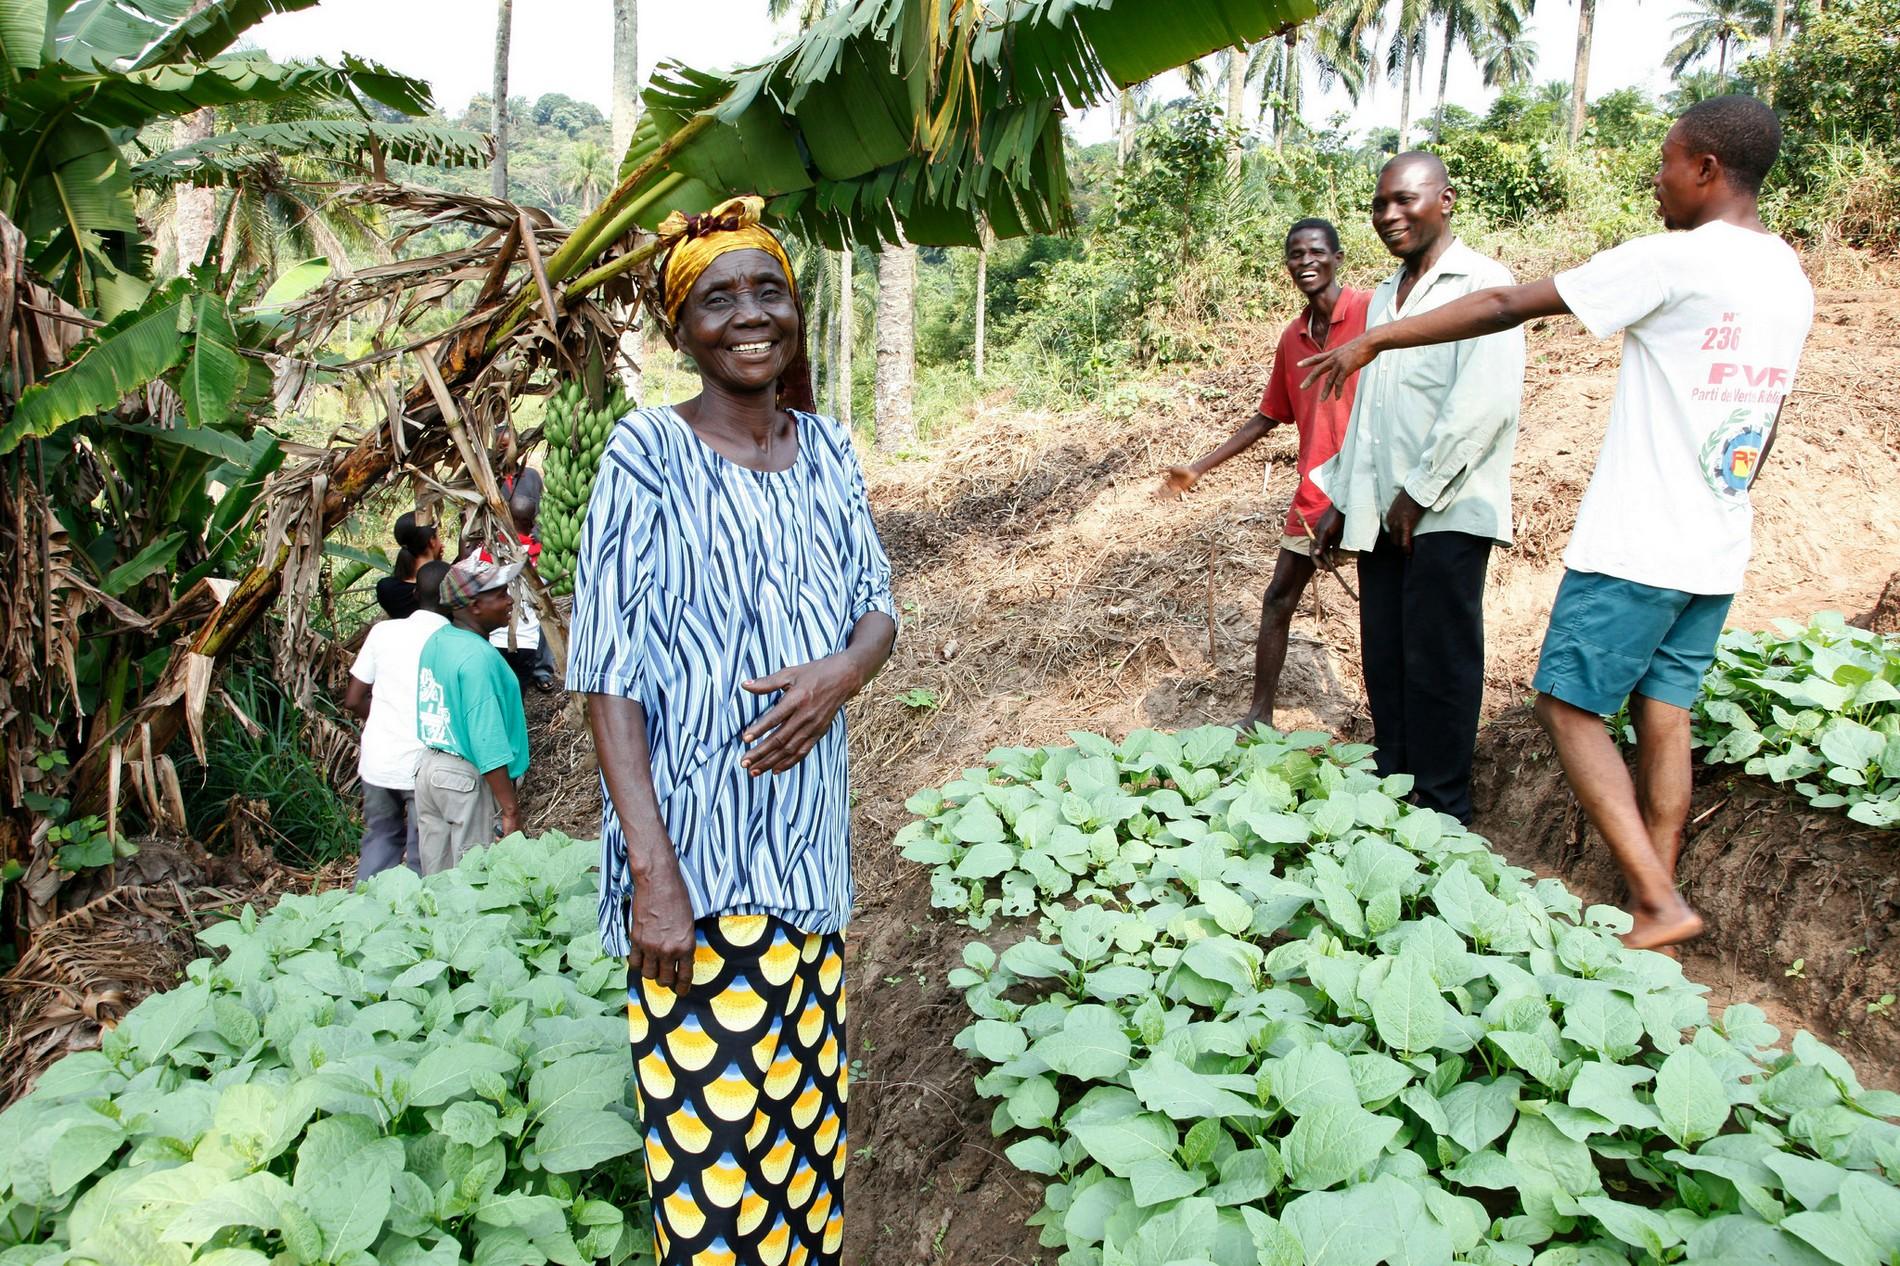 Femme heureuse de son jardin humanitaire